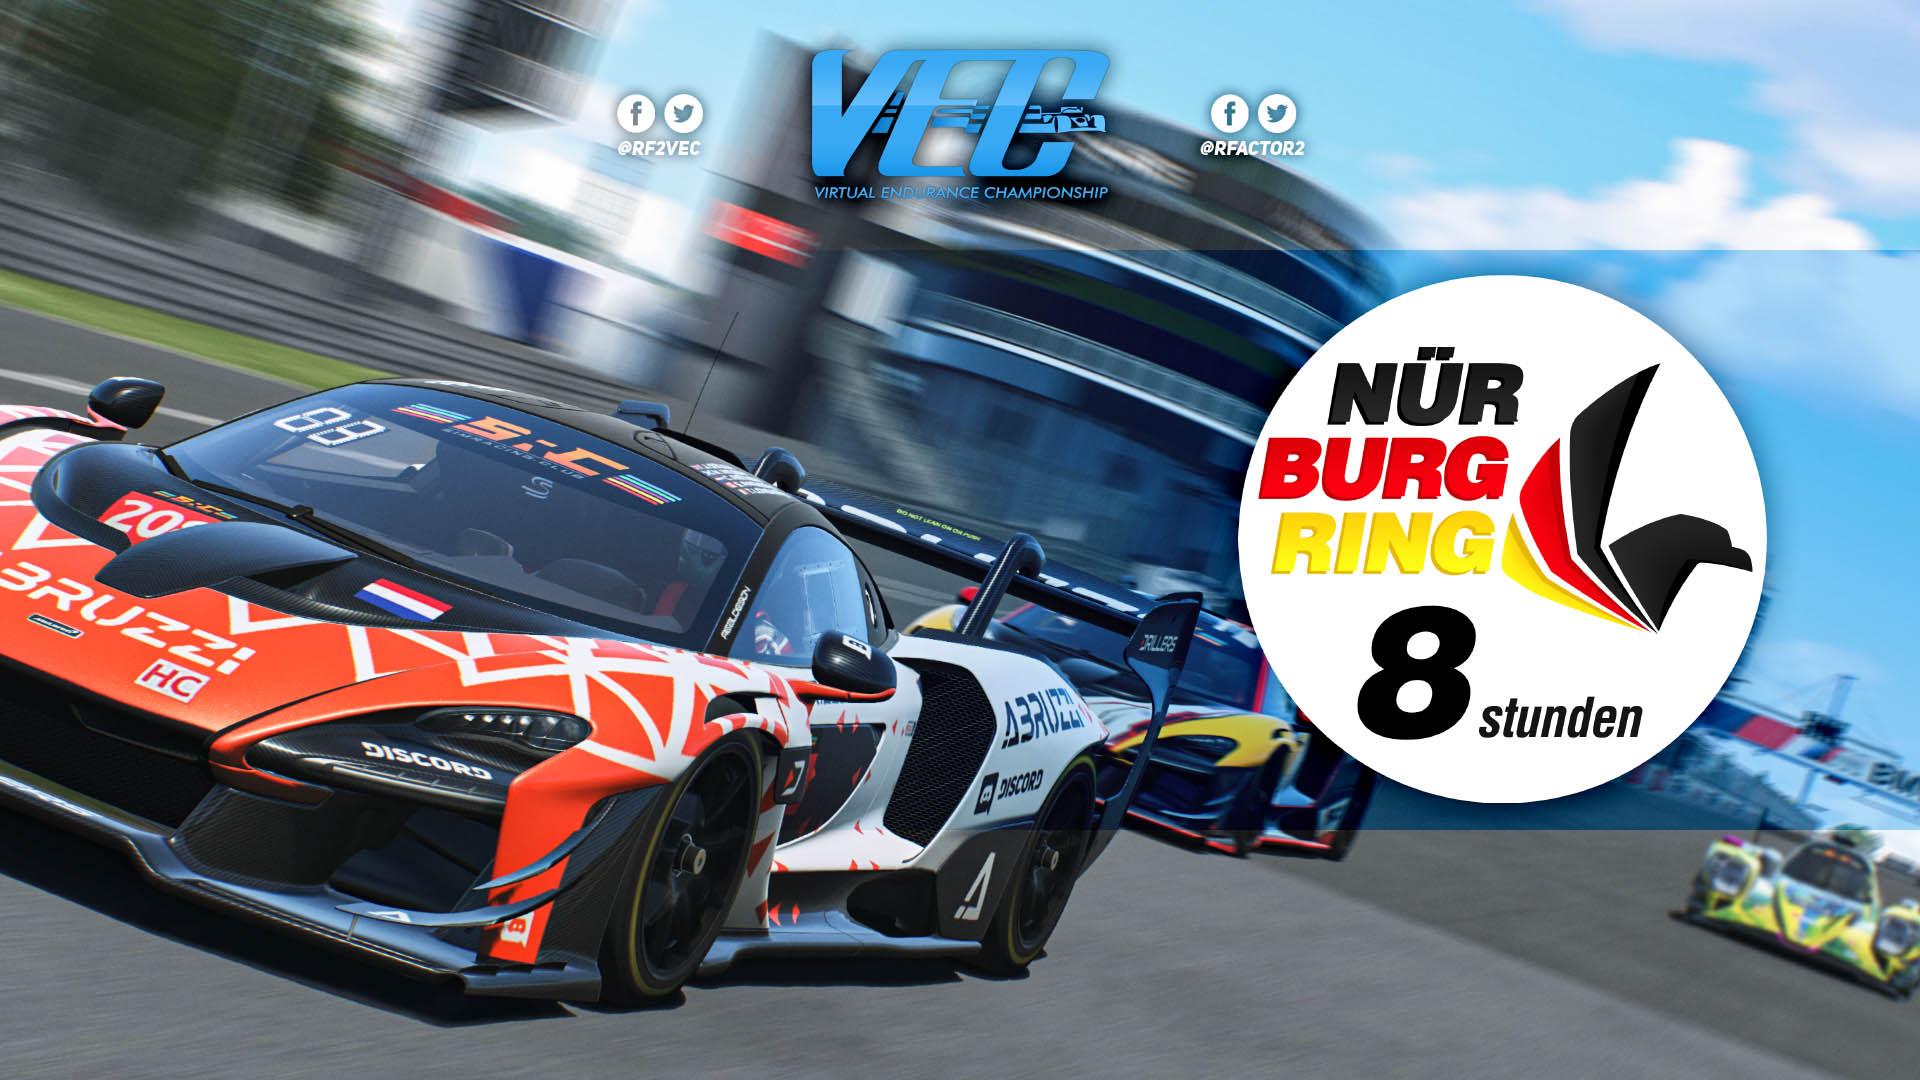 VEC-thumbnails-Nurburgring.jpg